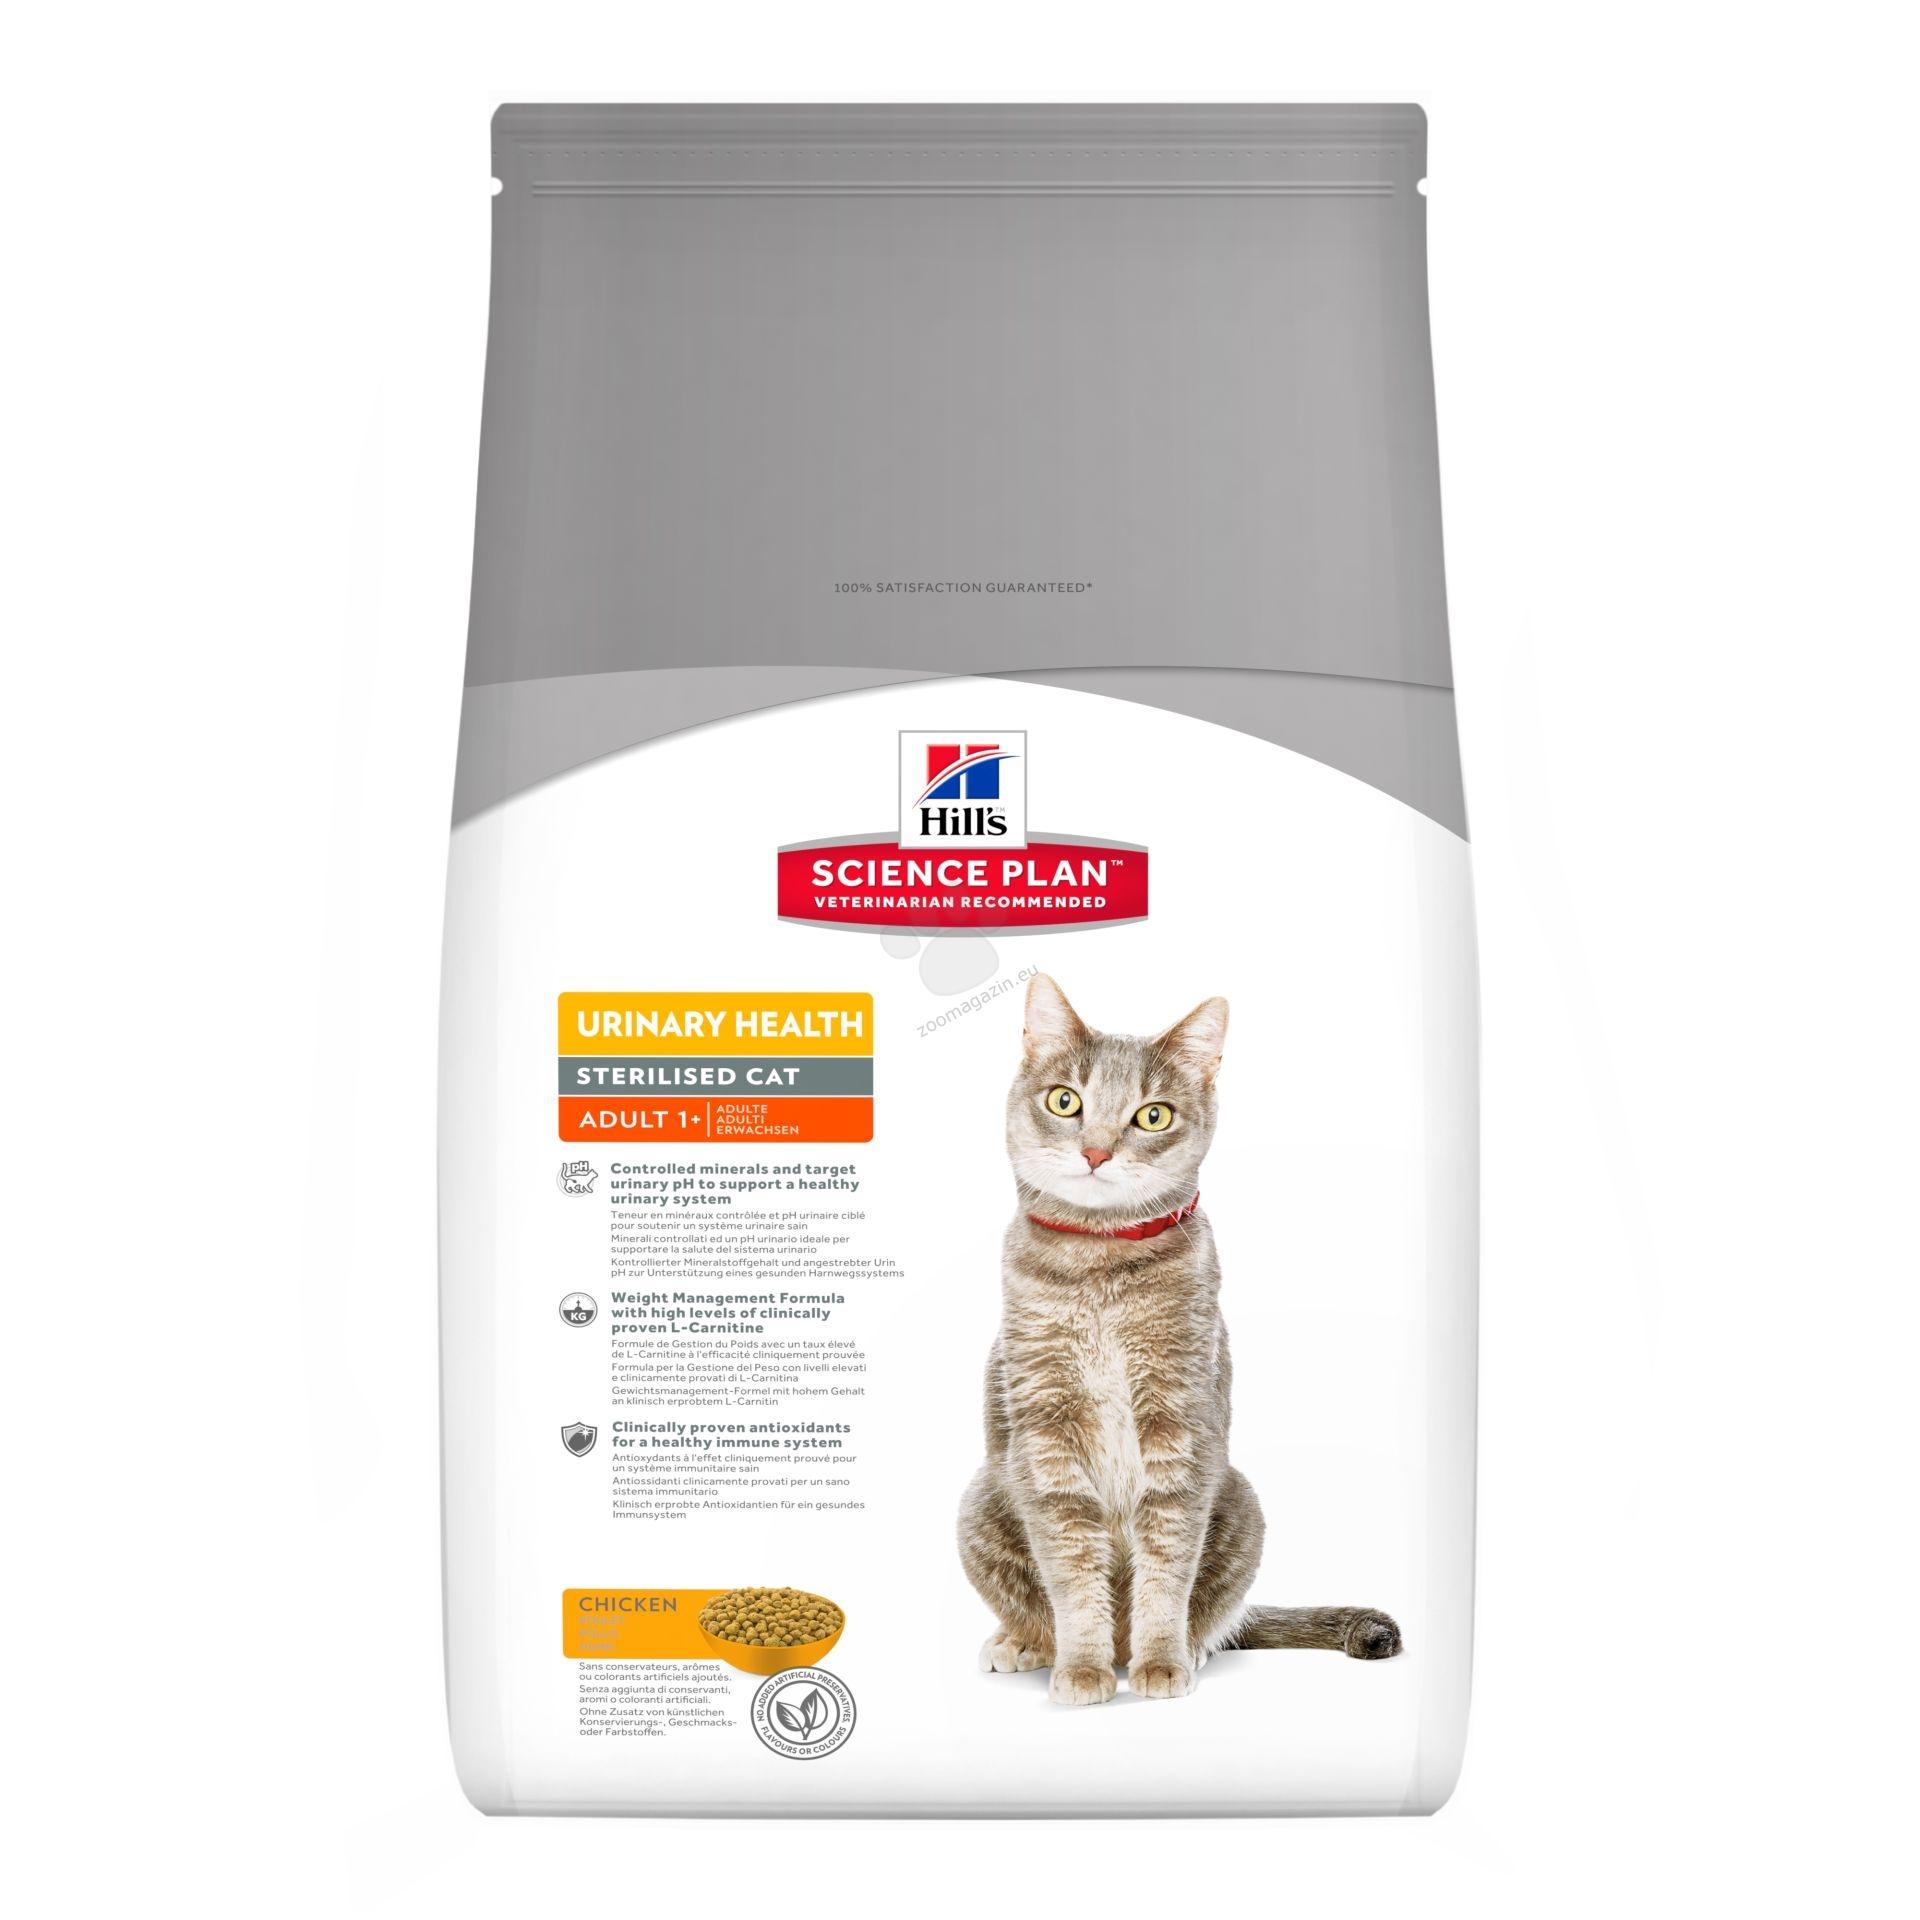 Science Plan Feline Adult Urinary&Sterilized Cat Chicken - с пилешко - за кастрирани котки и профилактика на уринарния тракт 1.5 кг.